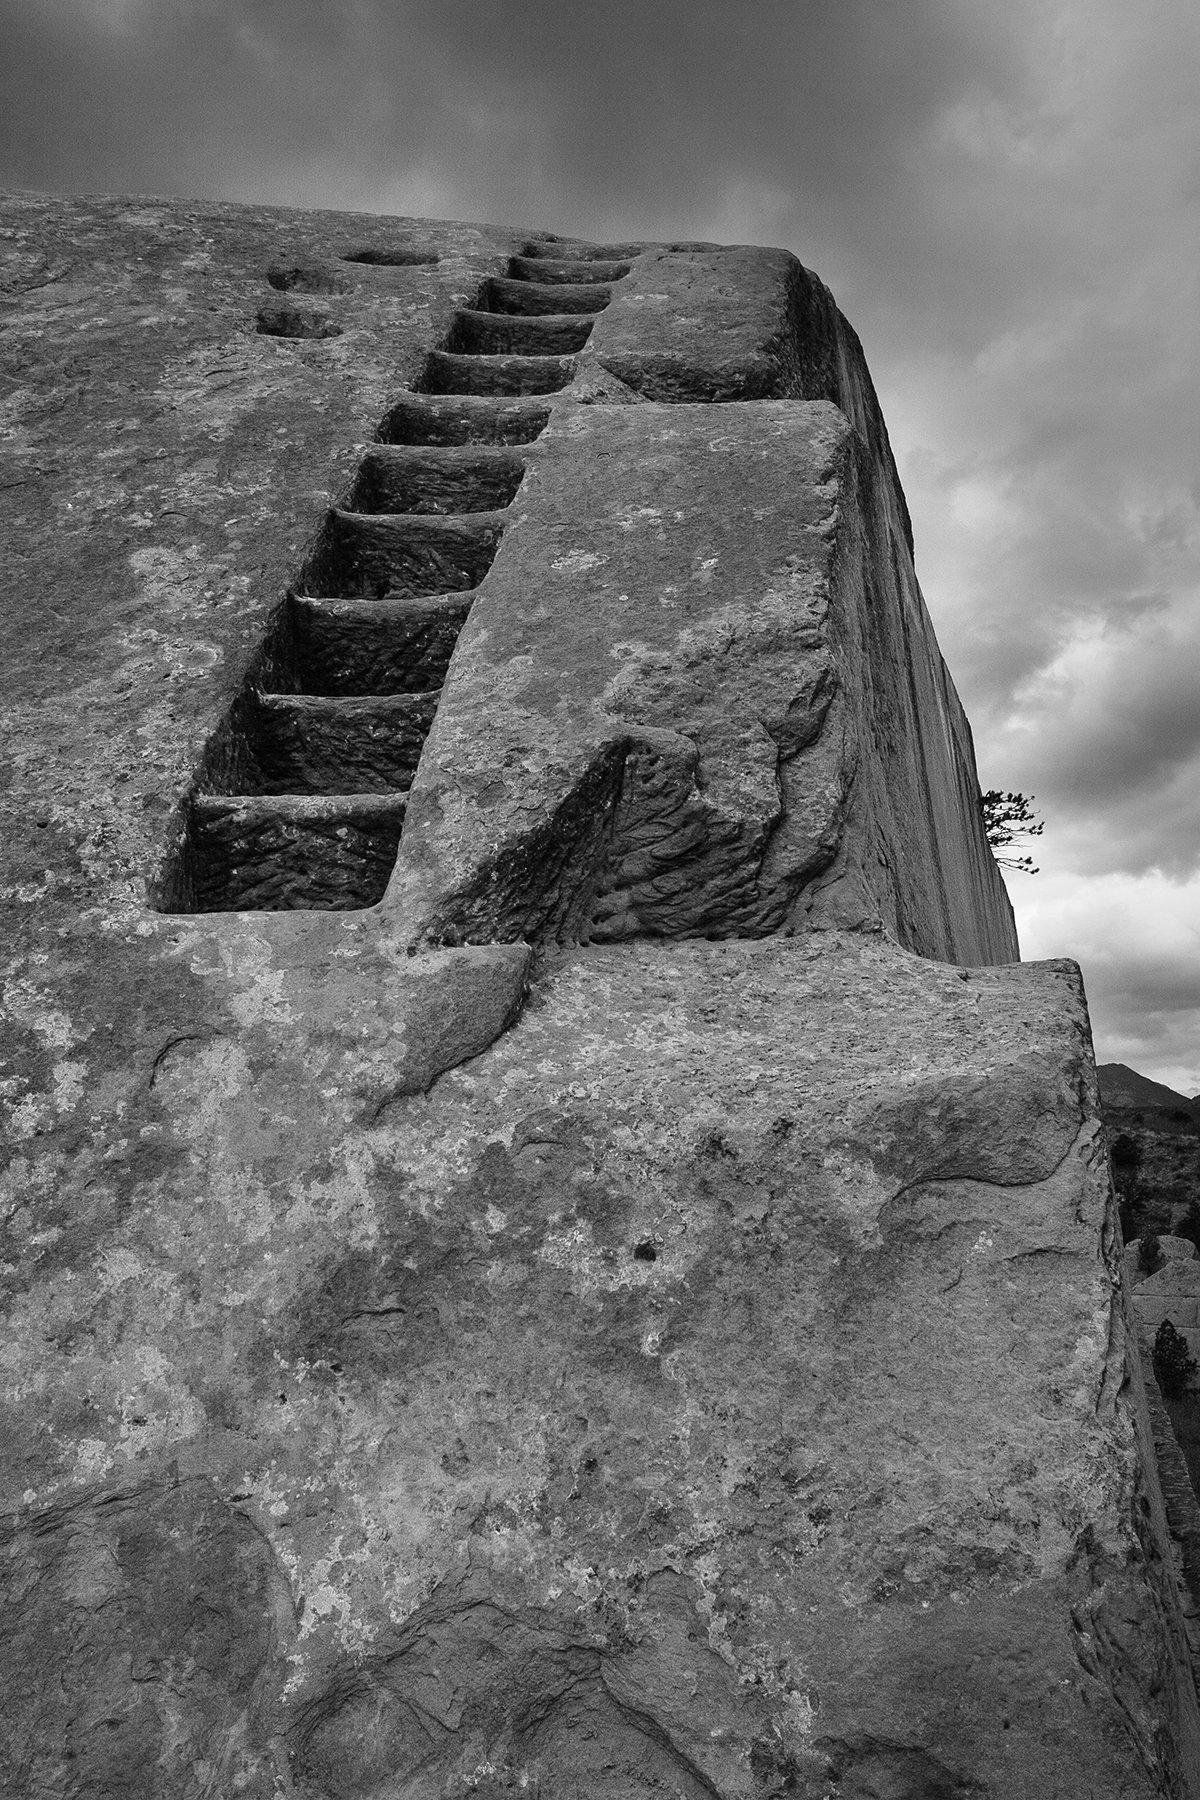 colorado-springs-landscape-black-and-white030.jpg